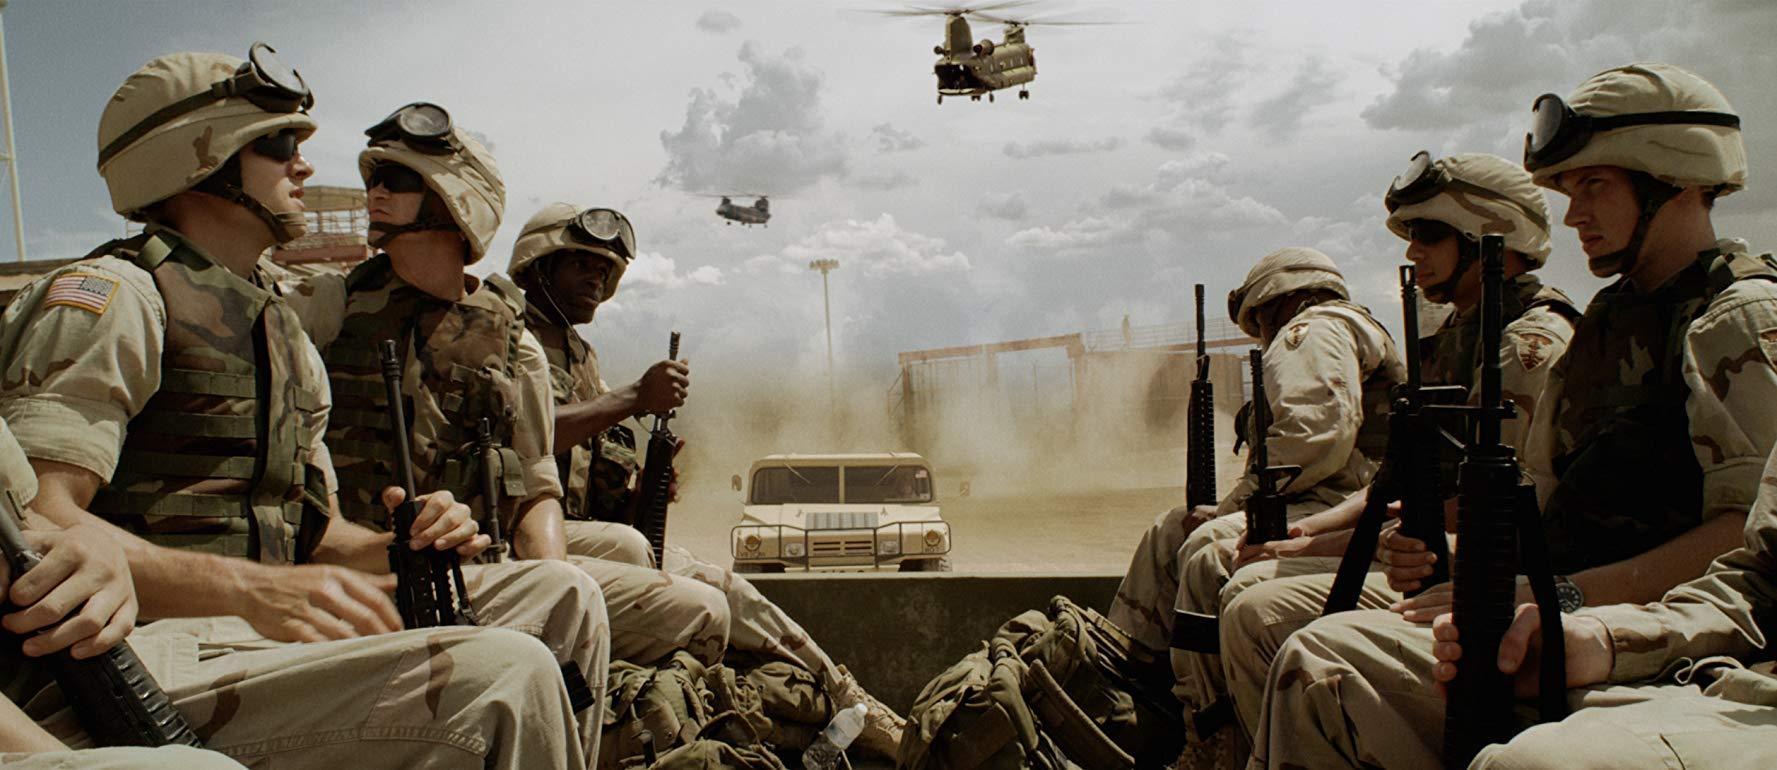 مشاهدة فيلم Boys Of Abu Ghraib 2014 HD مترجم كامل اون لاين